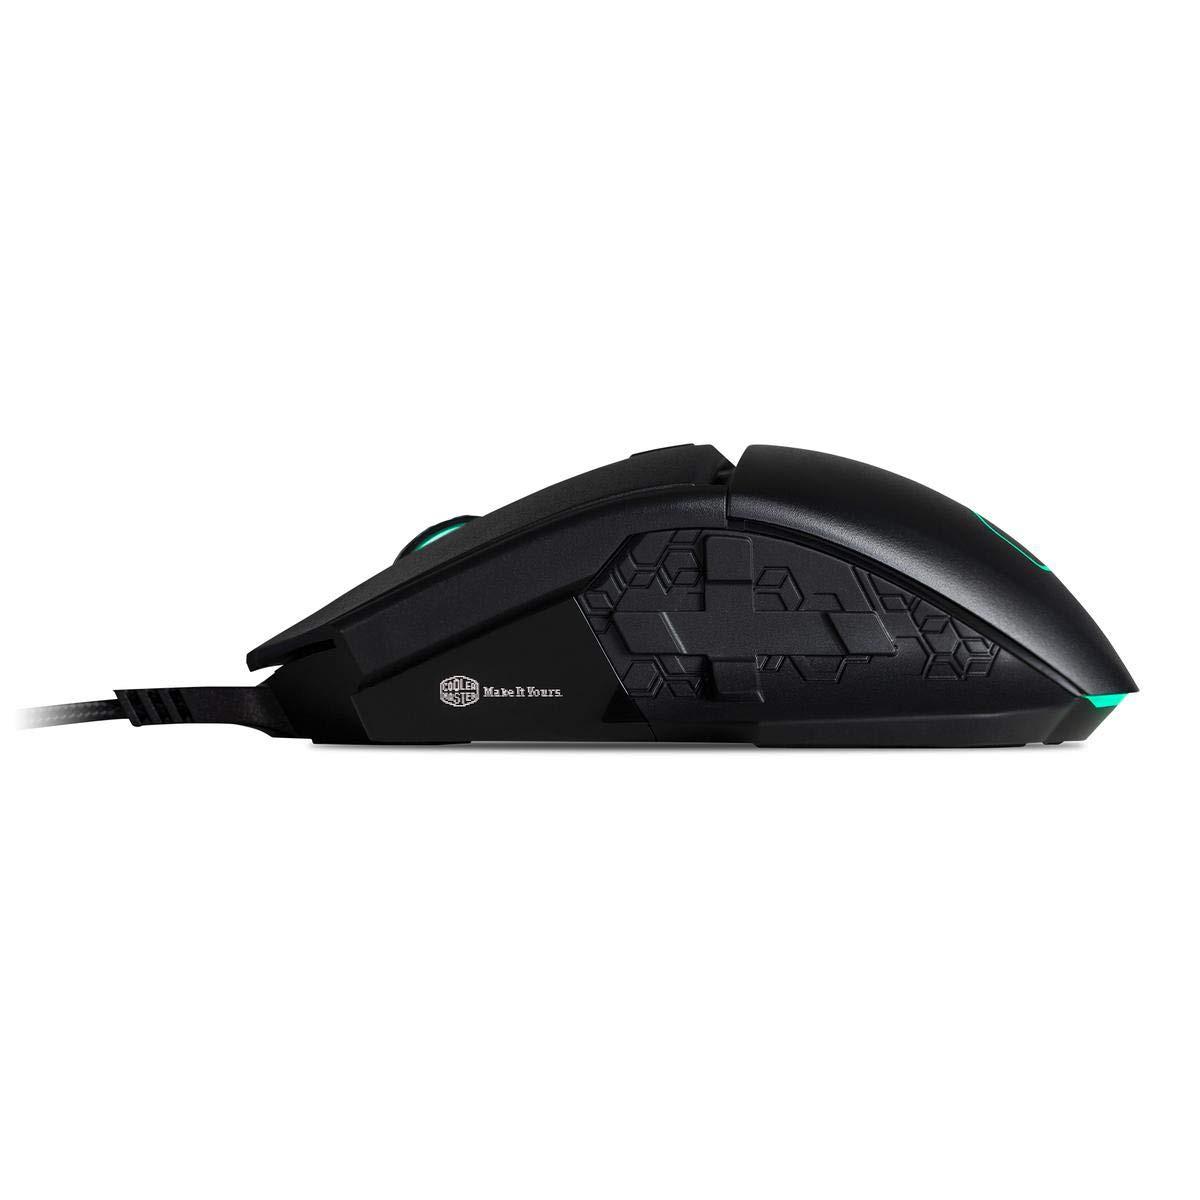 GAMING MOUSE COOLER MASTER MM830 24000DPI RGB ILLUMINATED BLACK